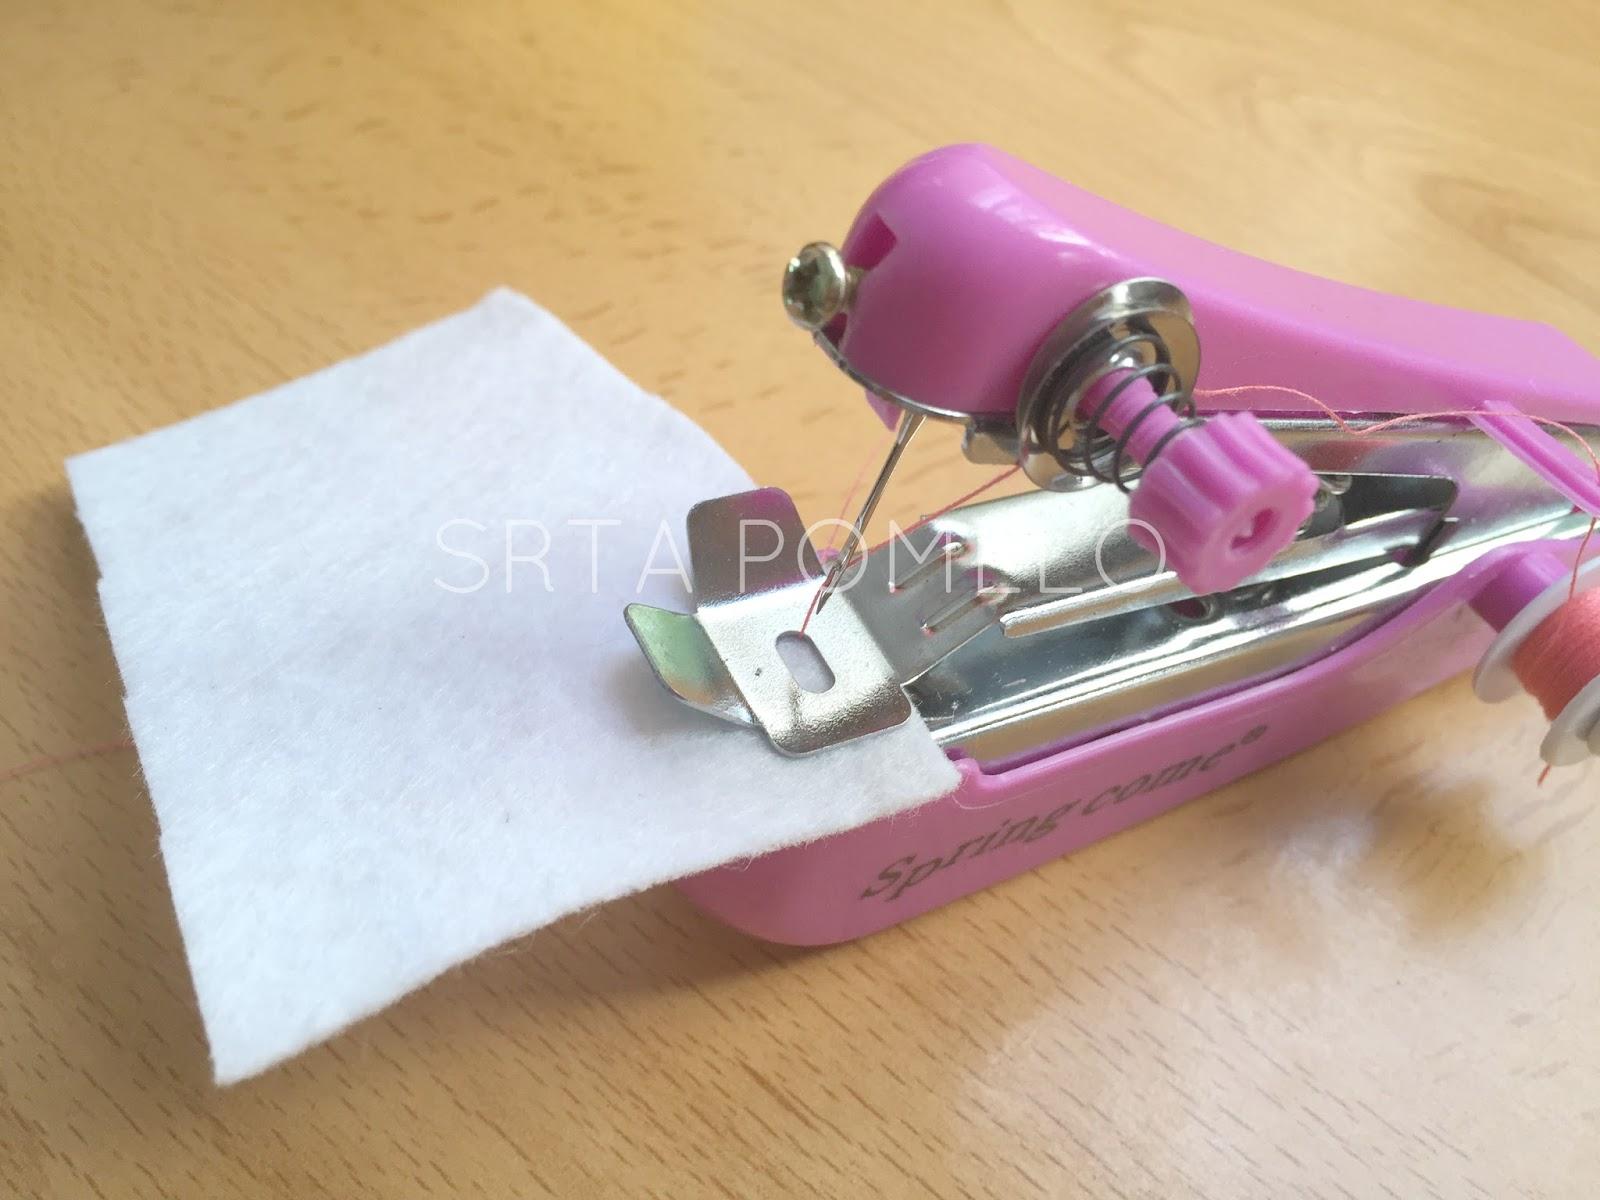 Srta pomelo c mo usar la m quina de coser manual for Como echar gotele sin maquina